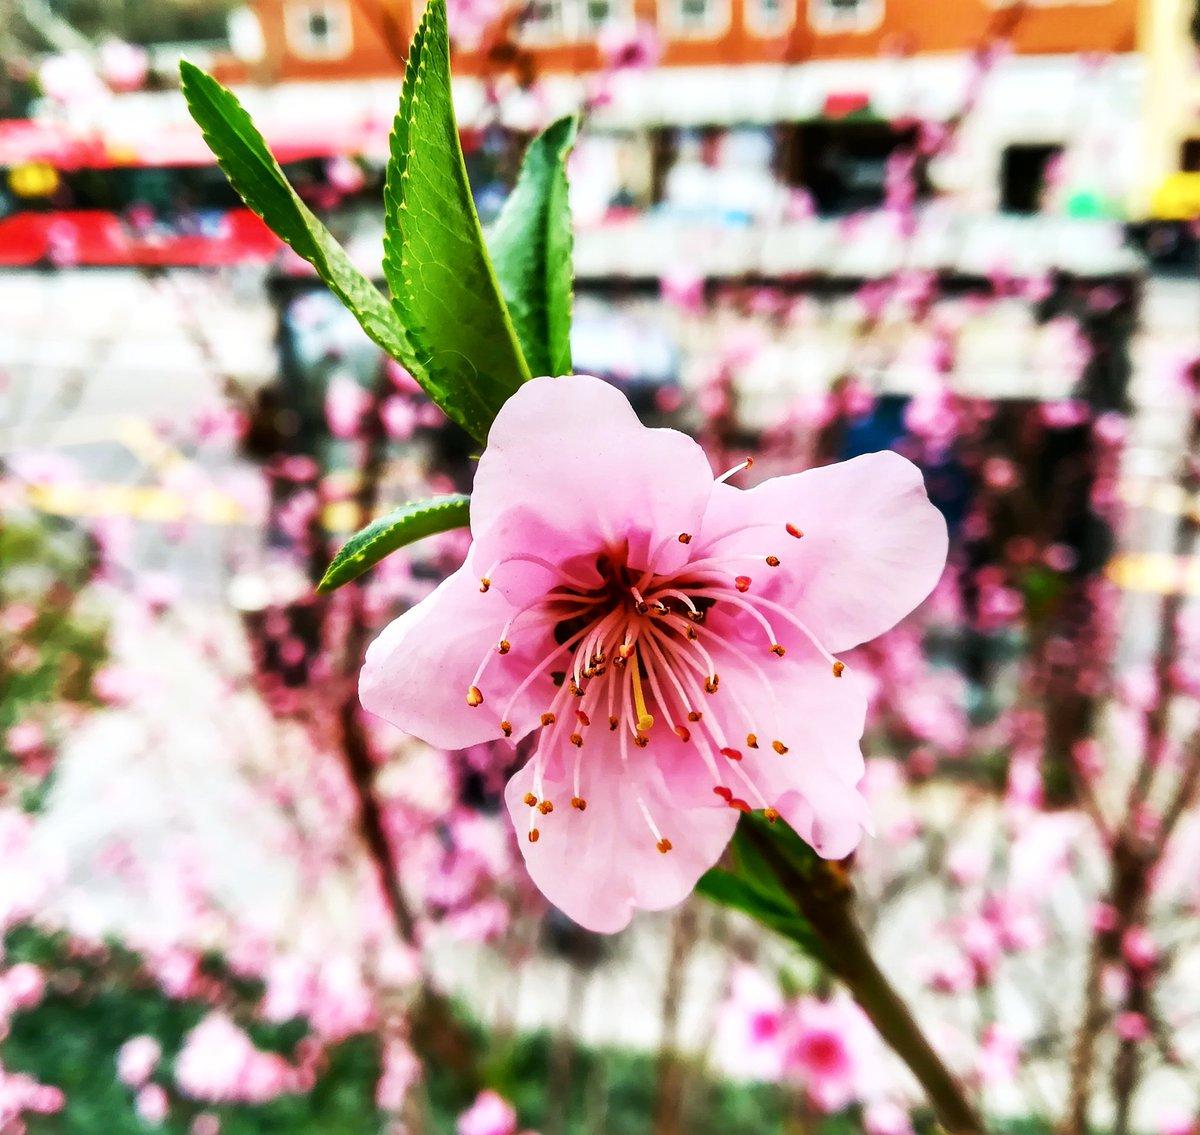 Dentro del hospital hay un invierno triste y a la salida una bonita primavera ... . .  #naturaleza #pics #foto #flowers #pink #goodmorning #flowerphotography #flowers #buenosdias  #bonjour  #fotografia #photography #flores   #green  #artphoto #verde #white #life #whiteflowers